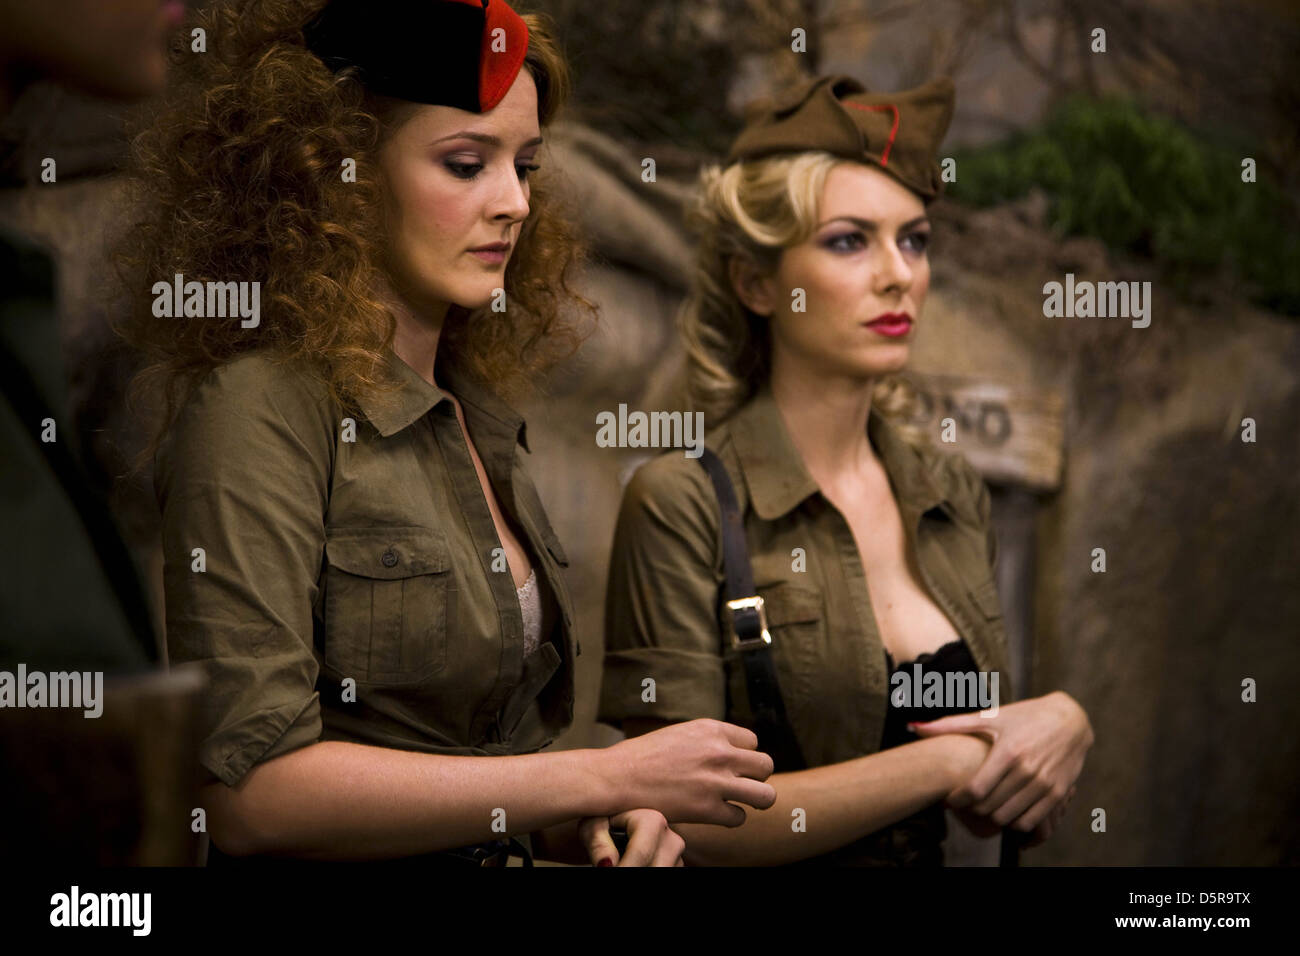 ANA POLVOROSA & KIRA MIRO NO LO LLAMES AMOR... LLAMALO X (2011). Imagen De Stock